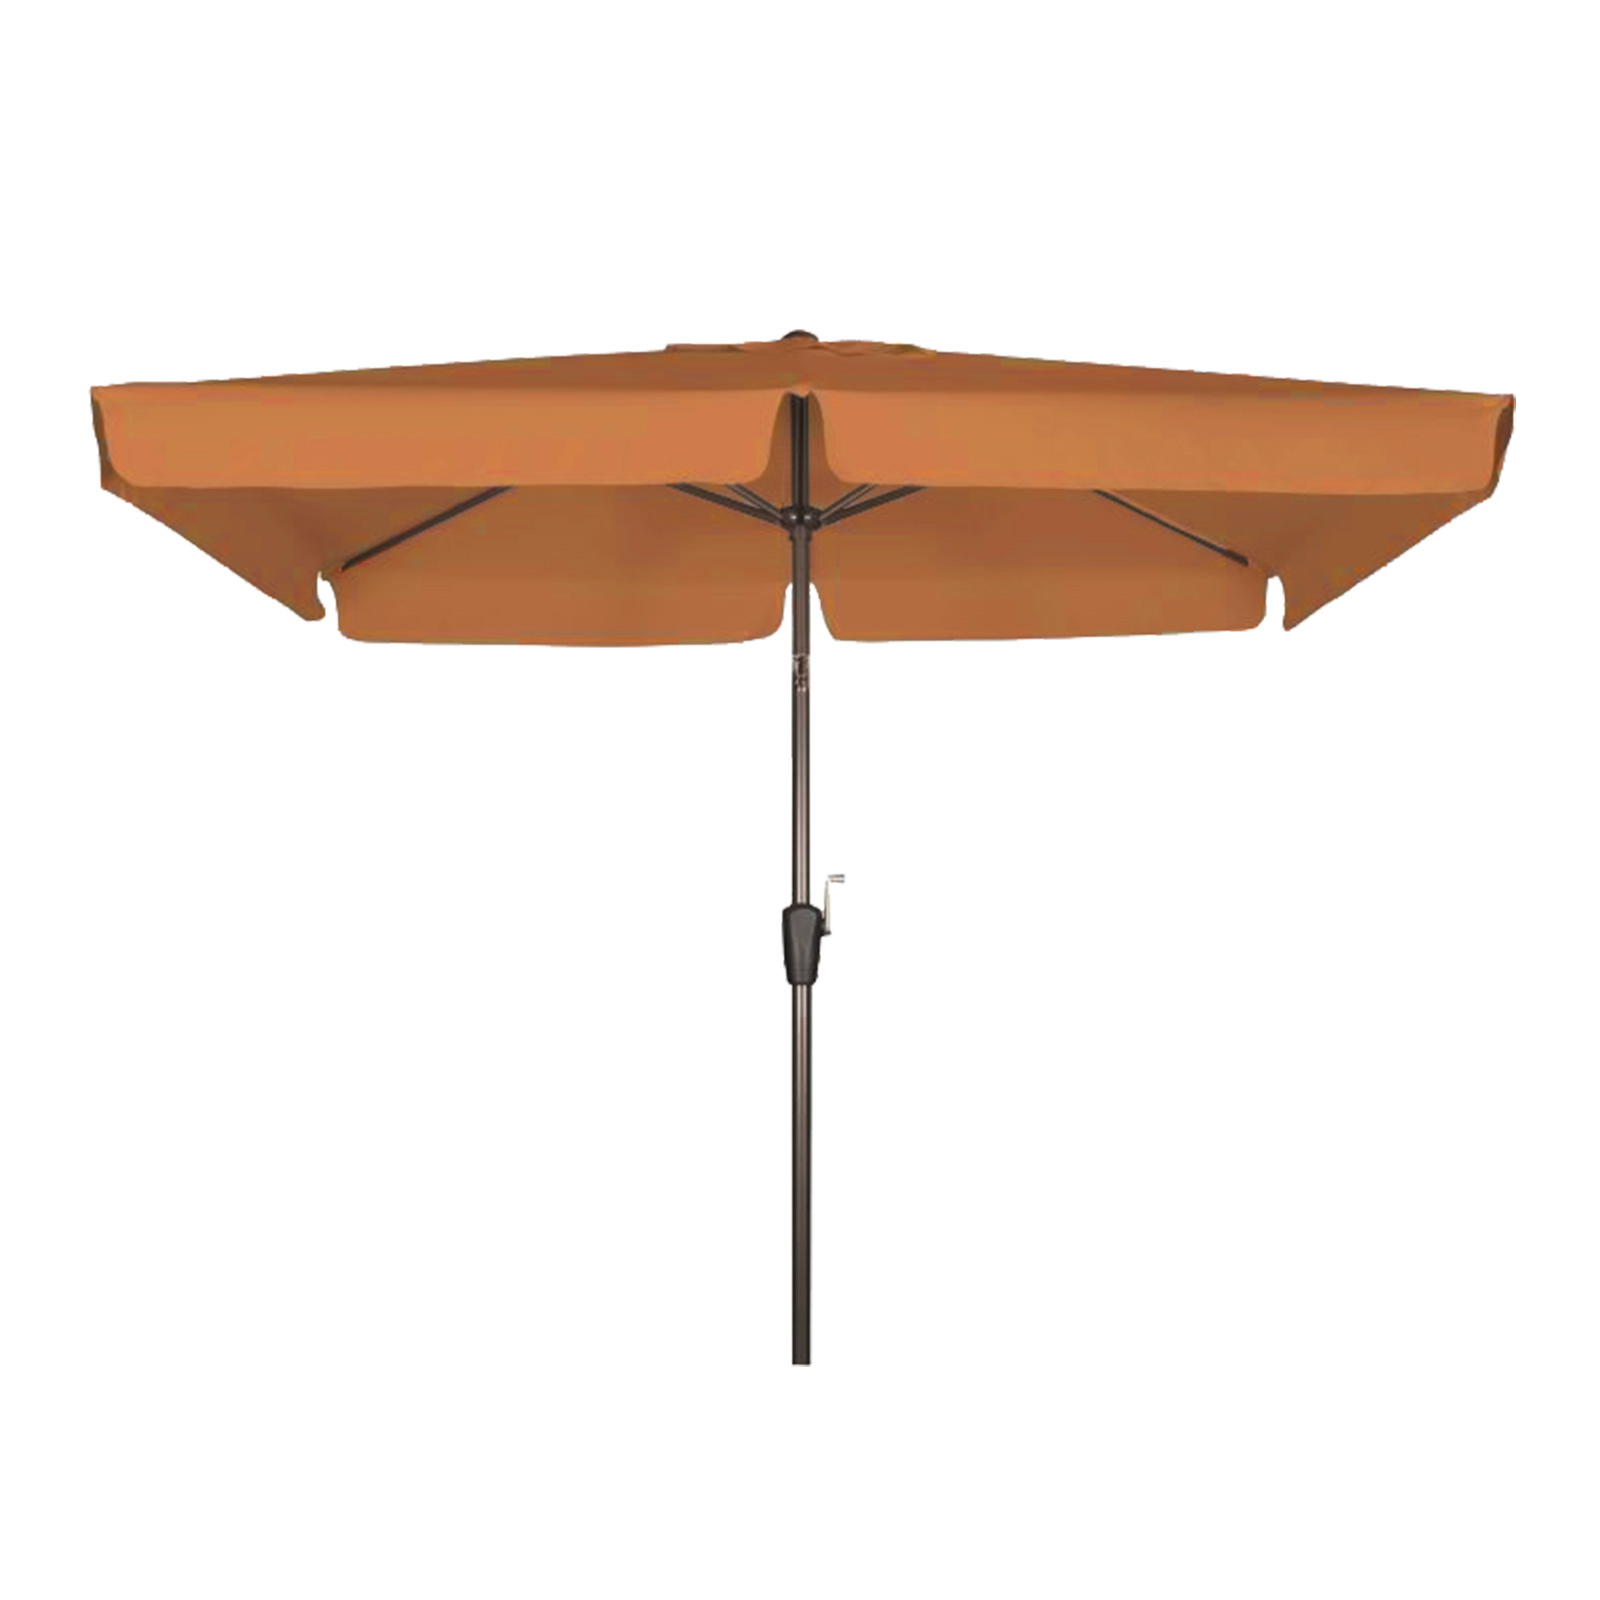 doppler kurbelschirm sonnenschirm basic lift umbra braun 210x140 cm rechteckig ebay. Black Bedroom Furniture Sets. Home Design Ideas